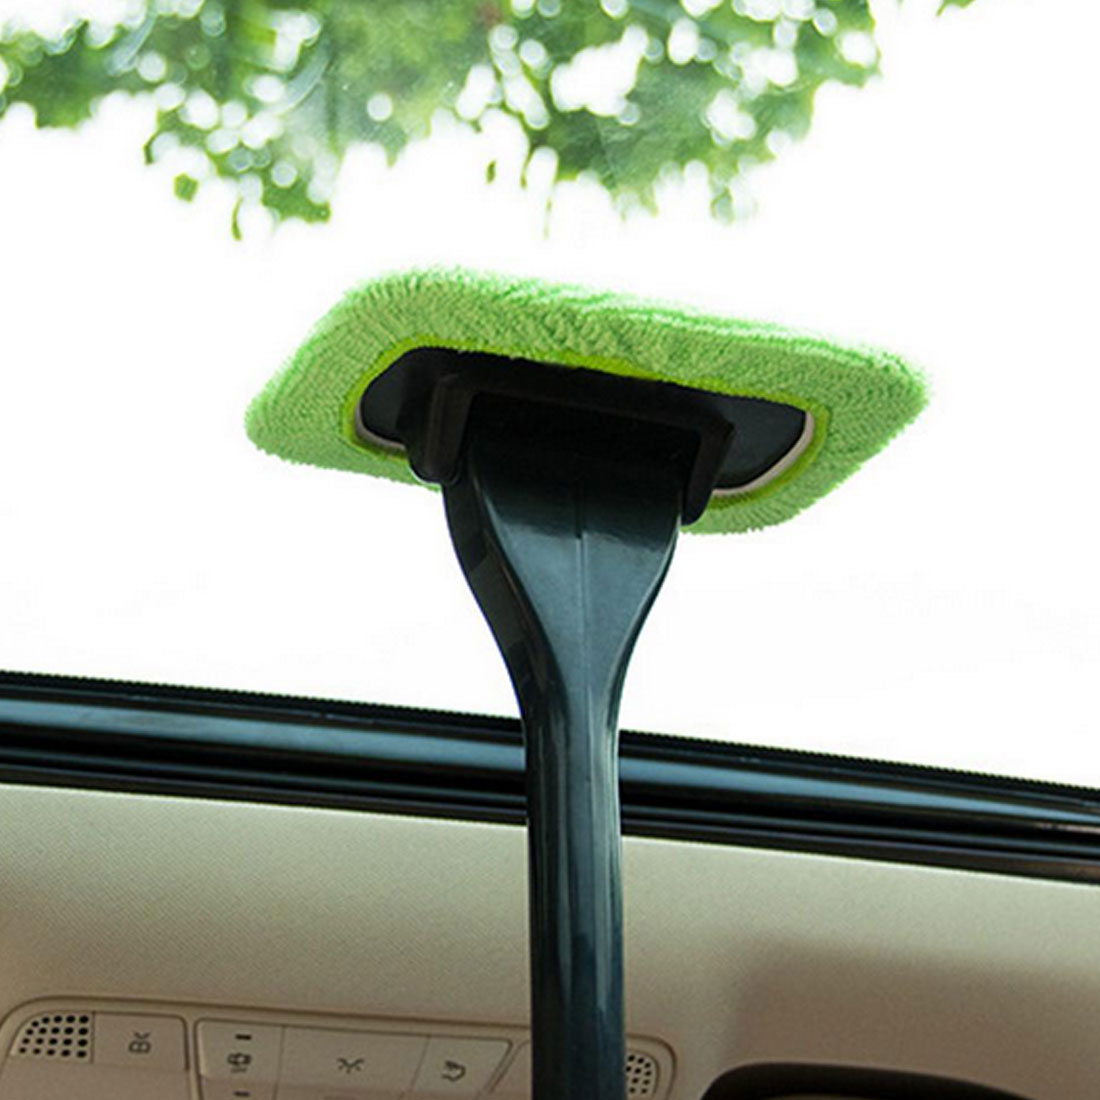 Car Auto Window Cleaner Microfiber Window Dust Fog Moisture Clean Brush Windshield Towel Washable Car Washer Cleaning Tool